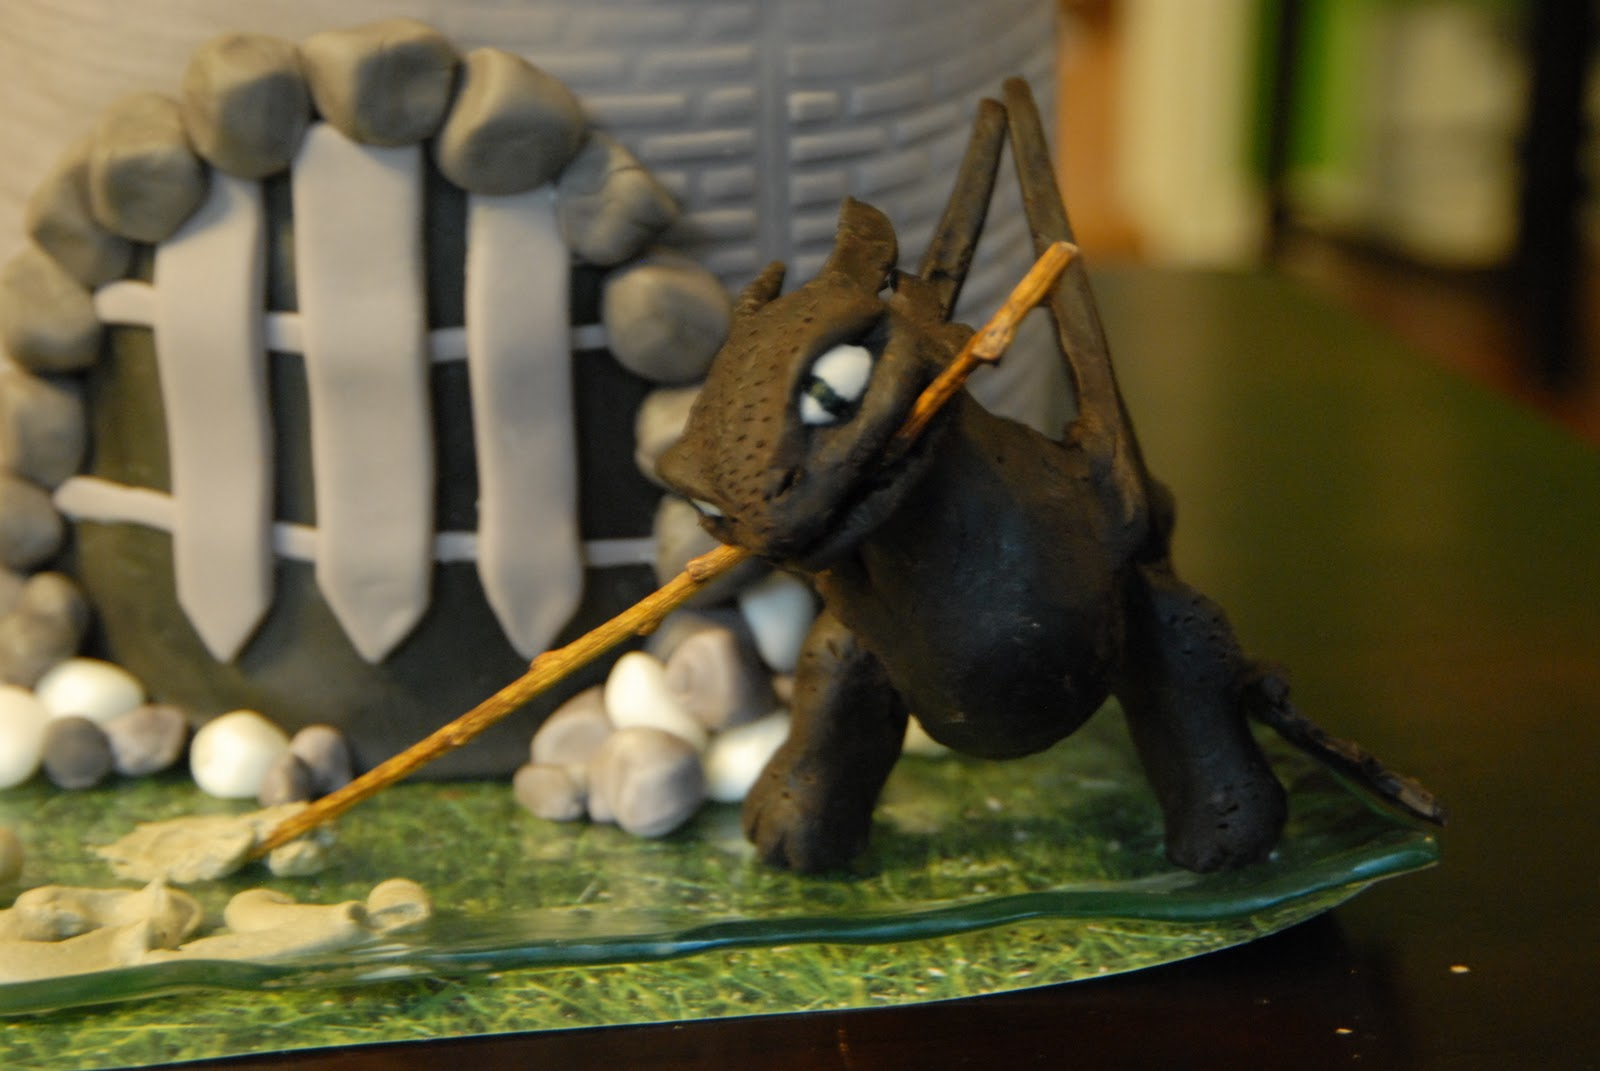 Cakelicious: Toothless Cake